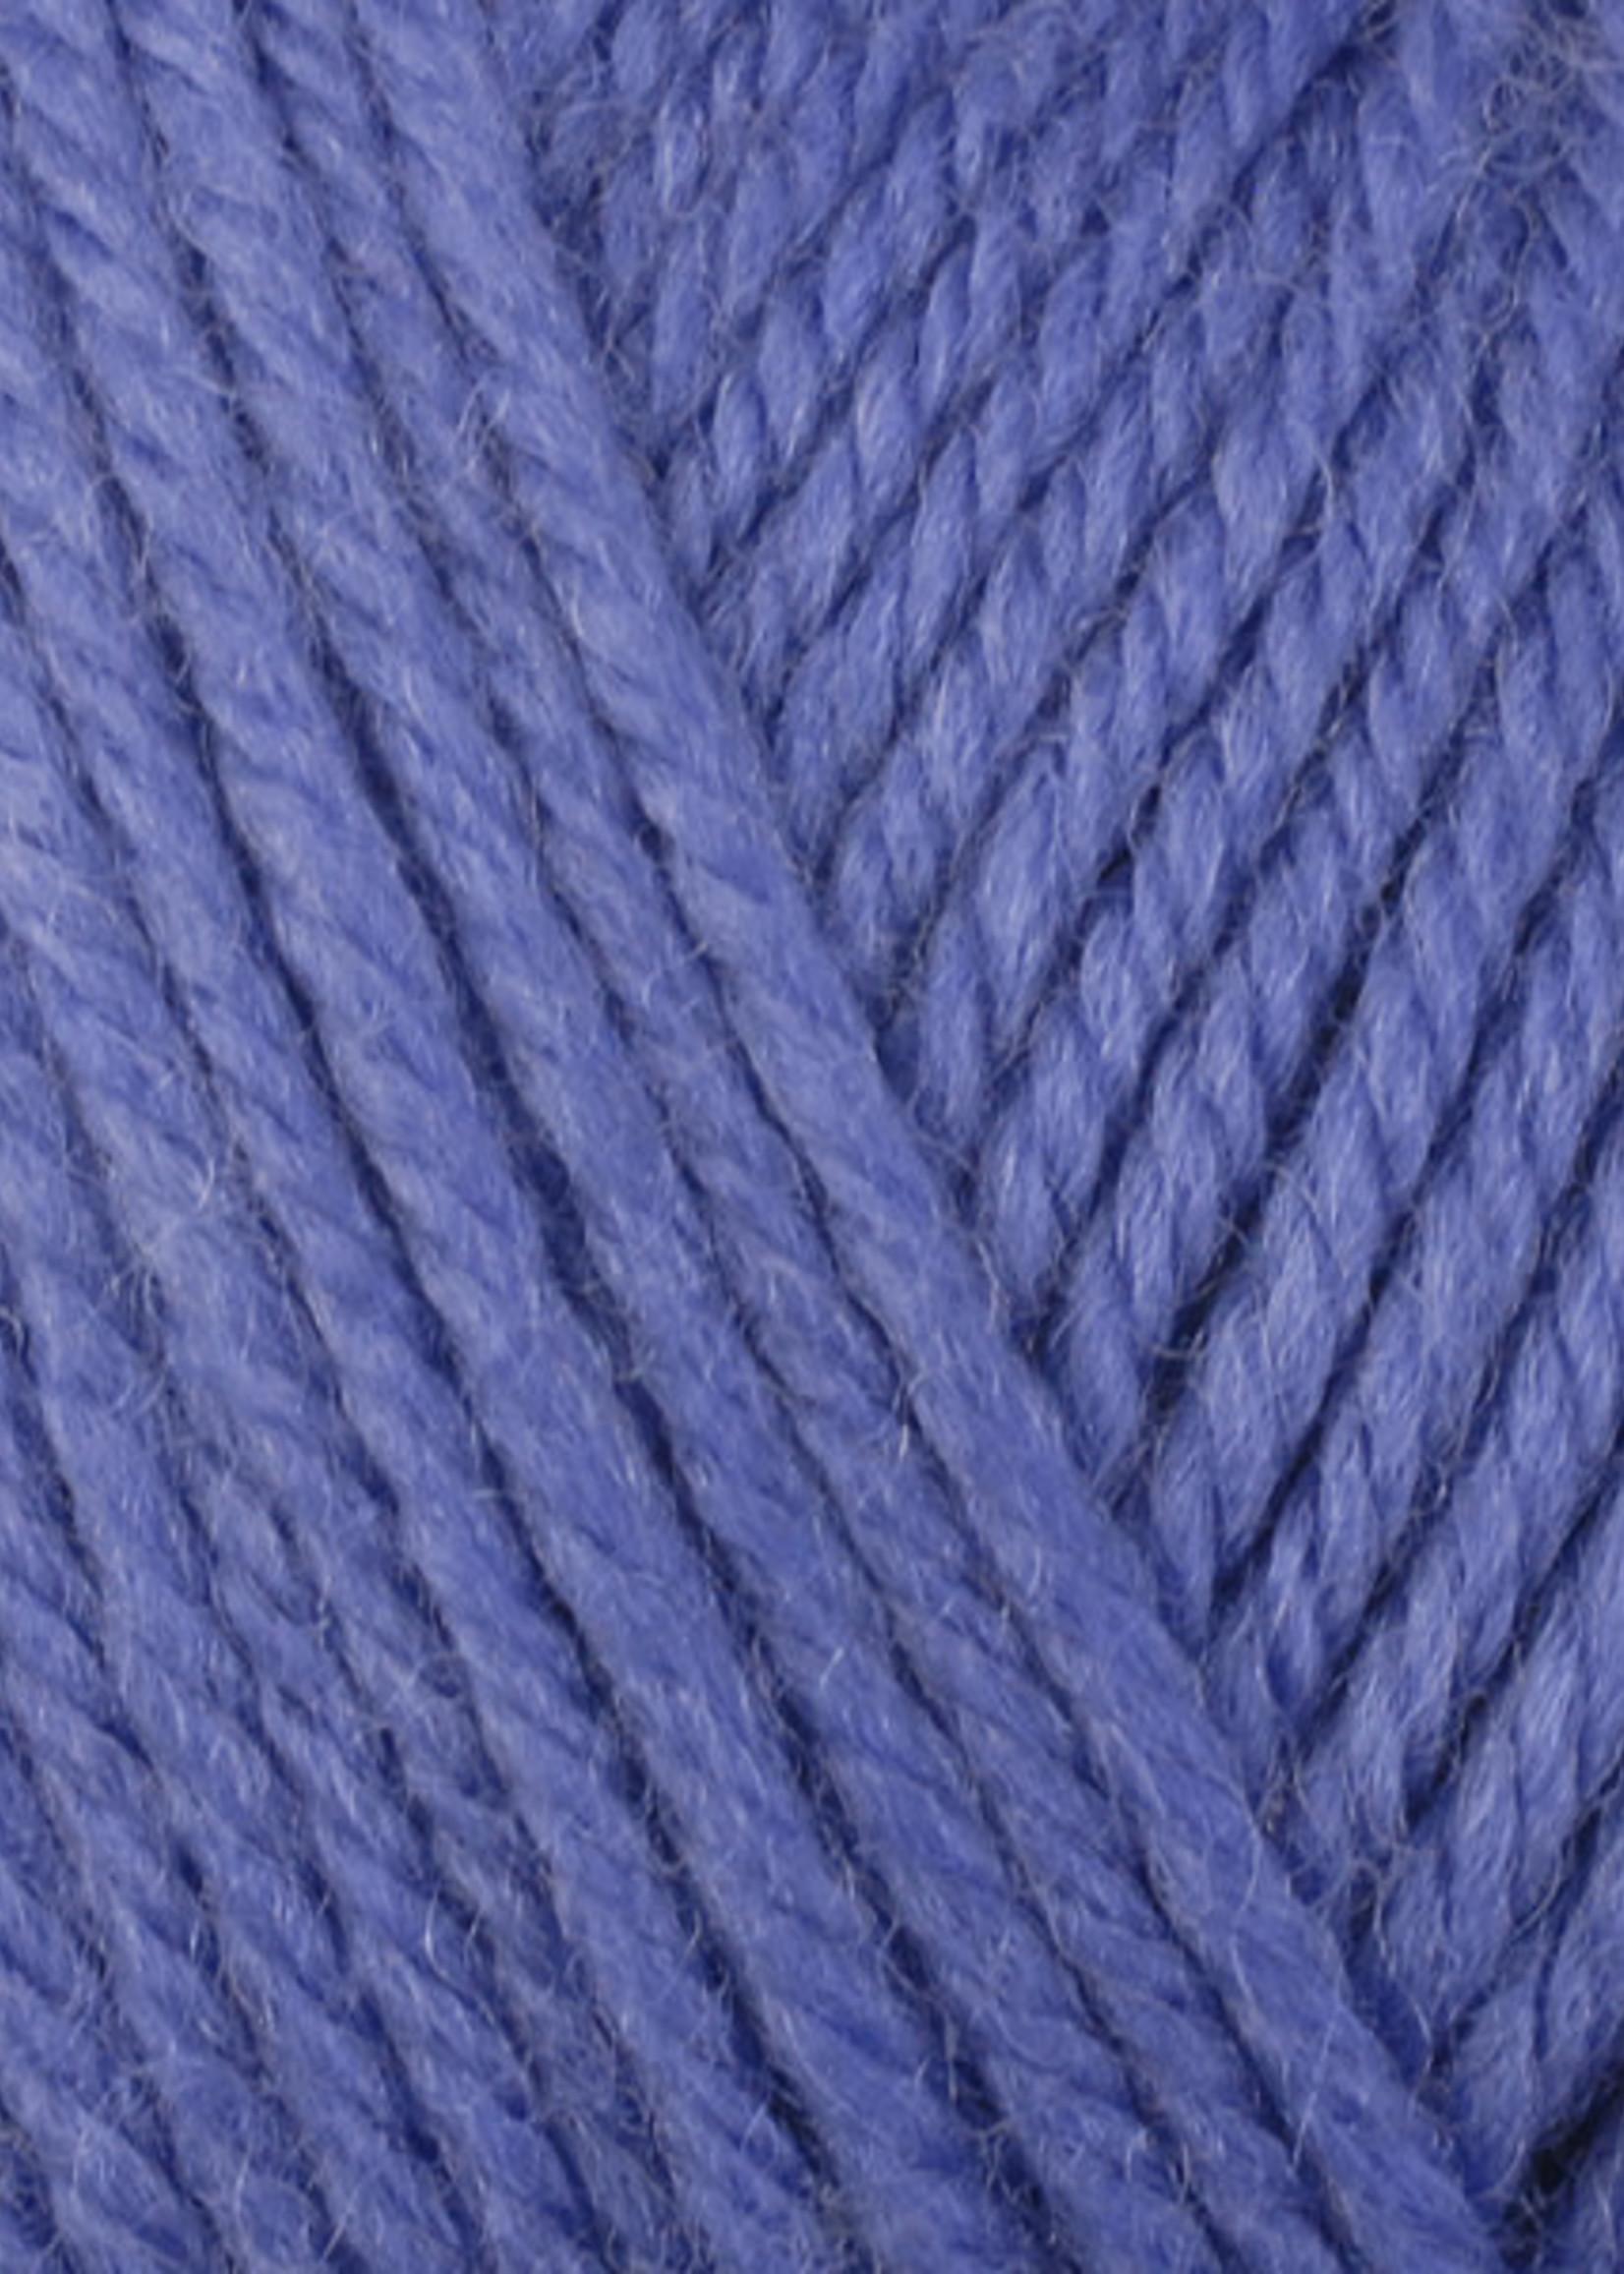 Berroco Berroco Ultra Wool 3333 Periwinkle